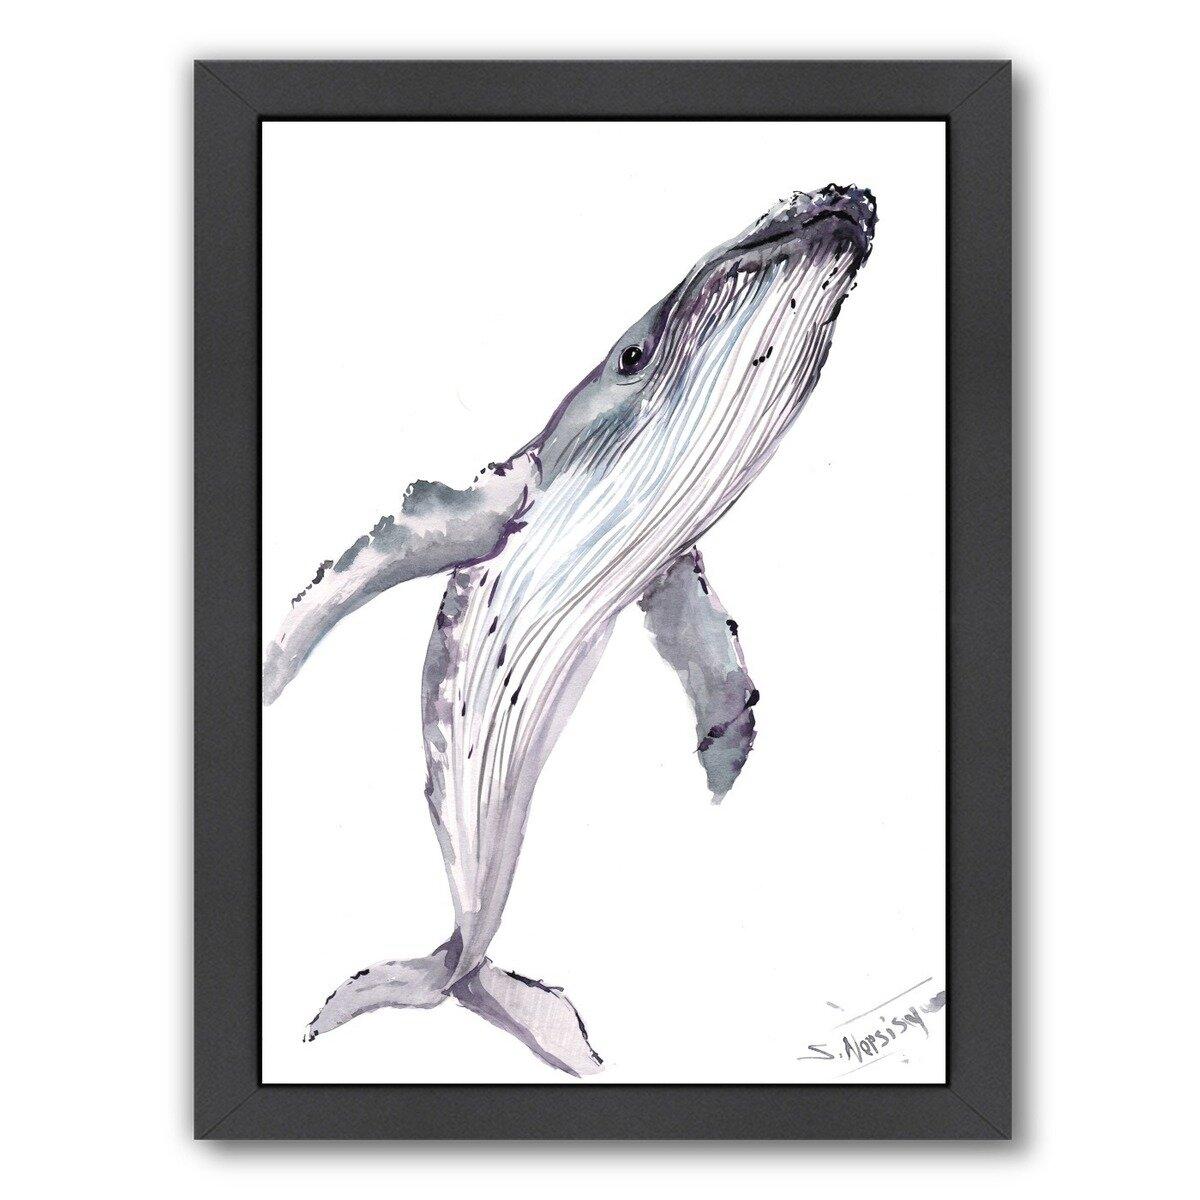 East Urban Home Humpback Whale Framed Painting Print Wayfair